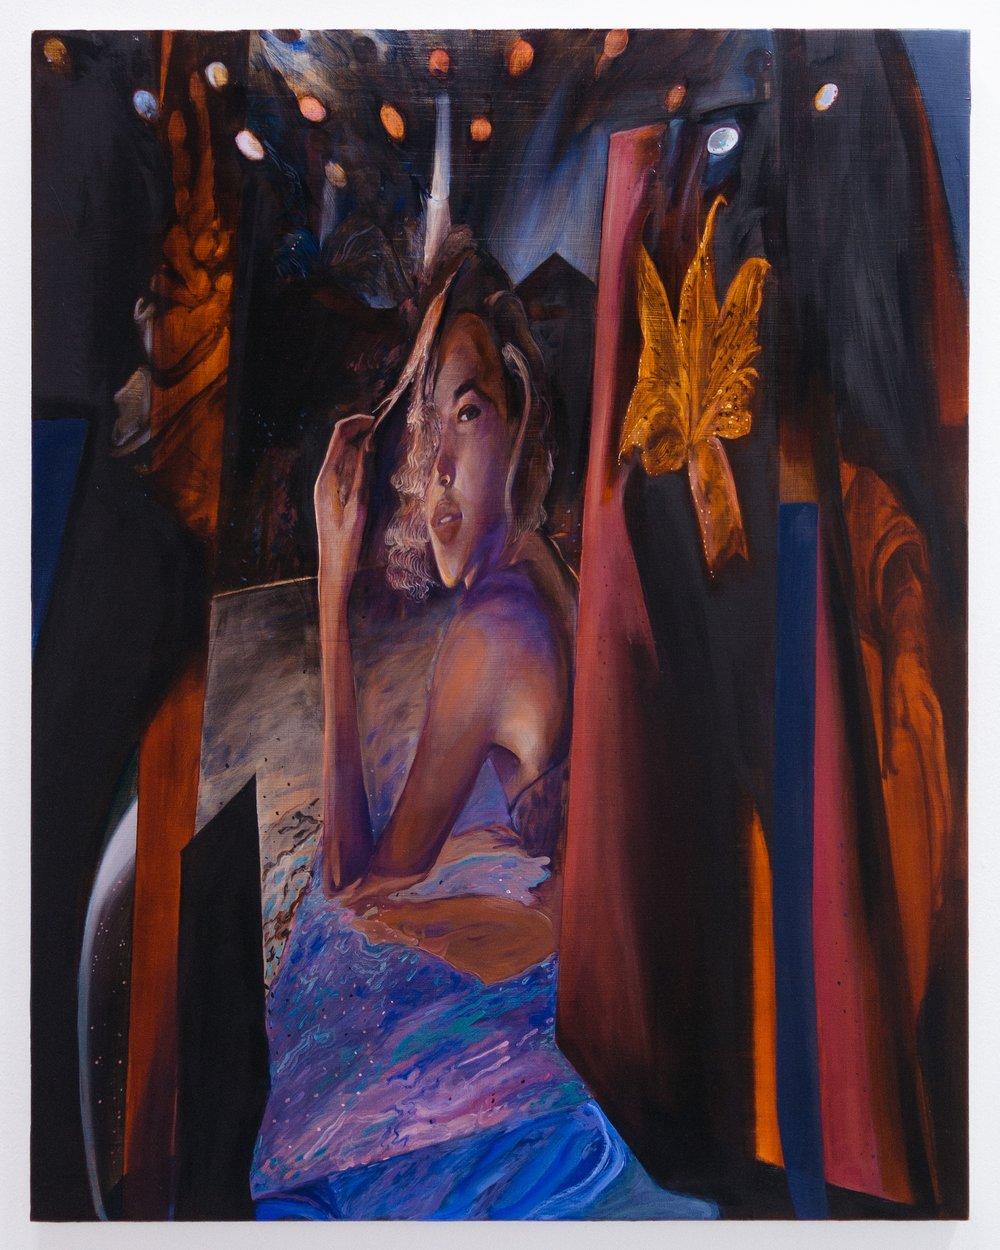 American Gothic pt. ii , 2017  Oil on canvas  90 x 70 cm